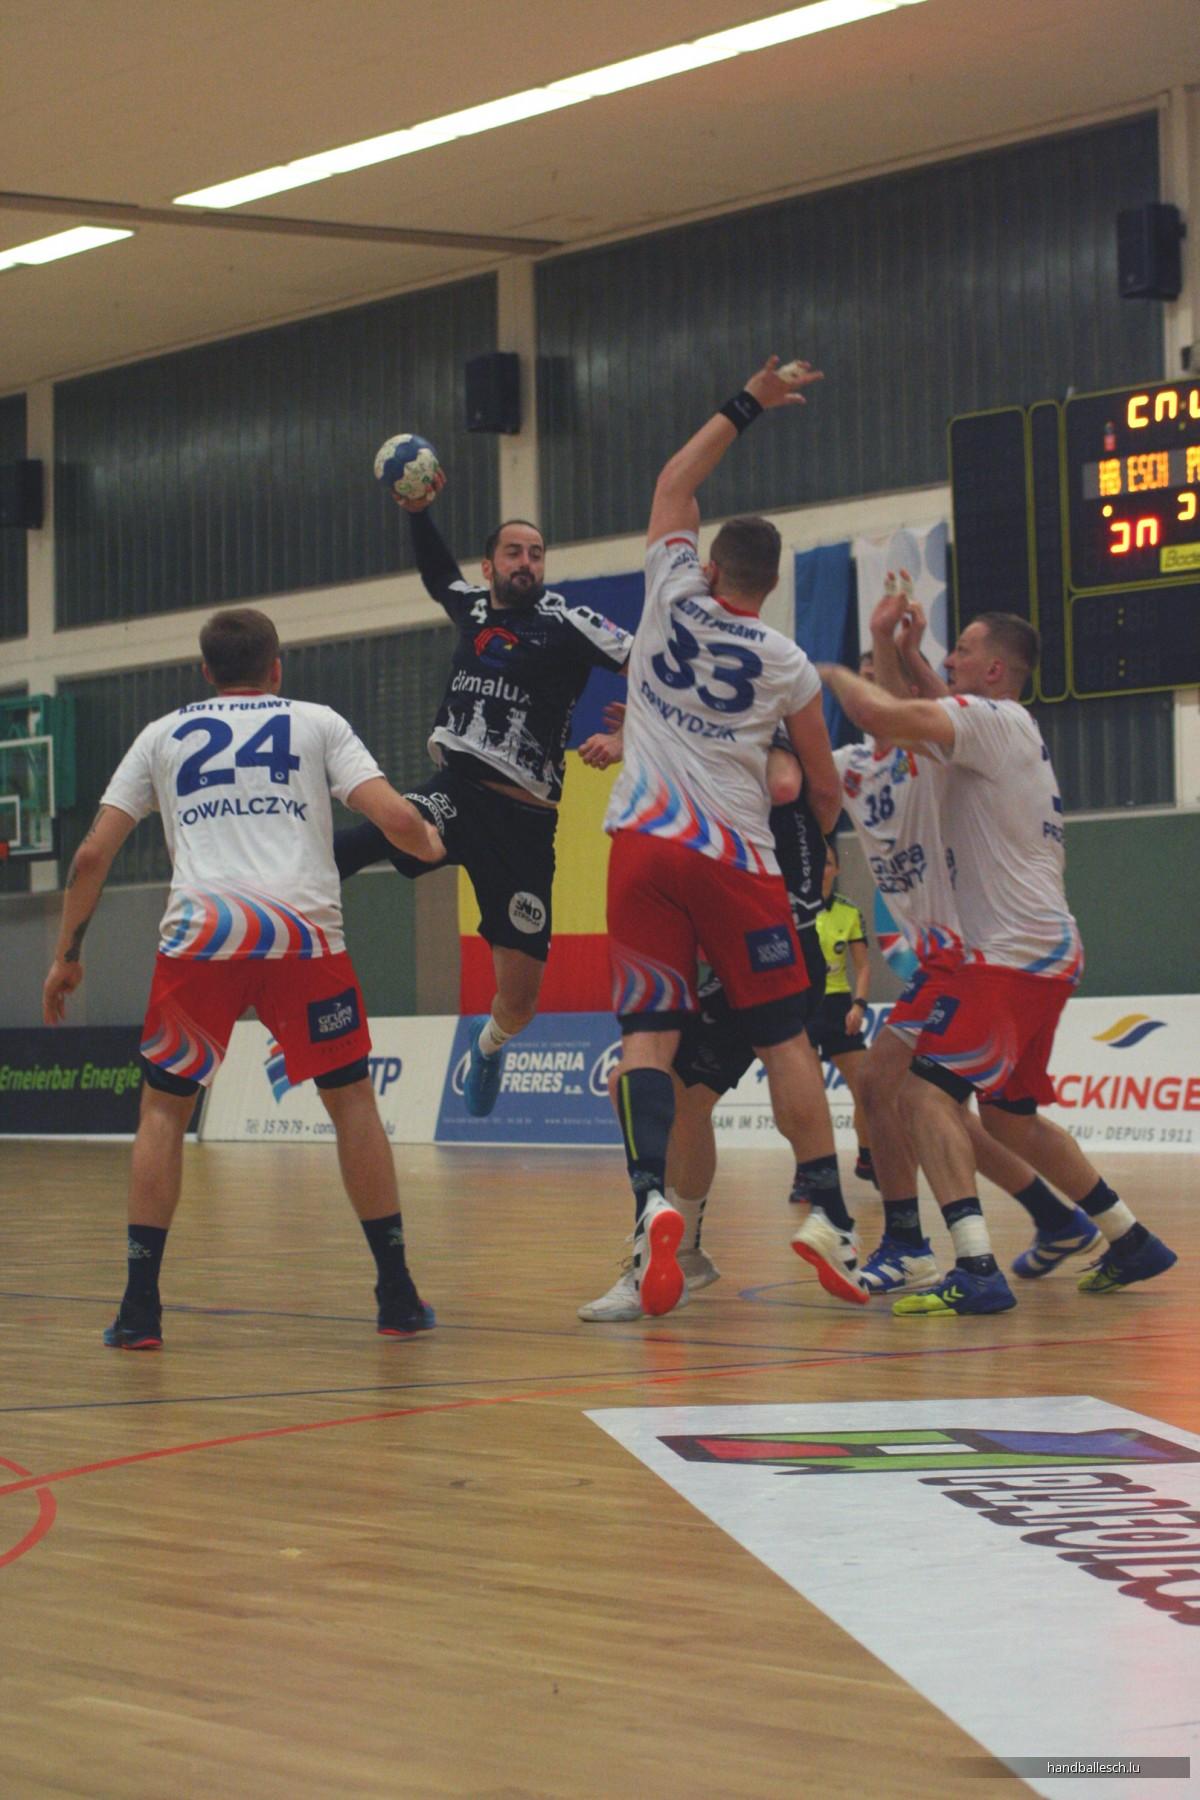 Fotoen Retour 2. Ronn EHF-Cup